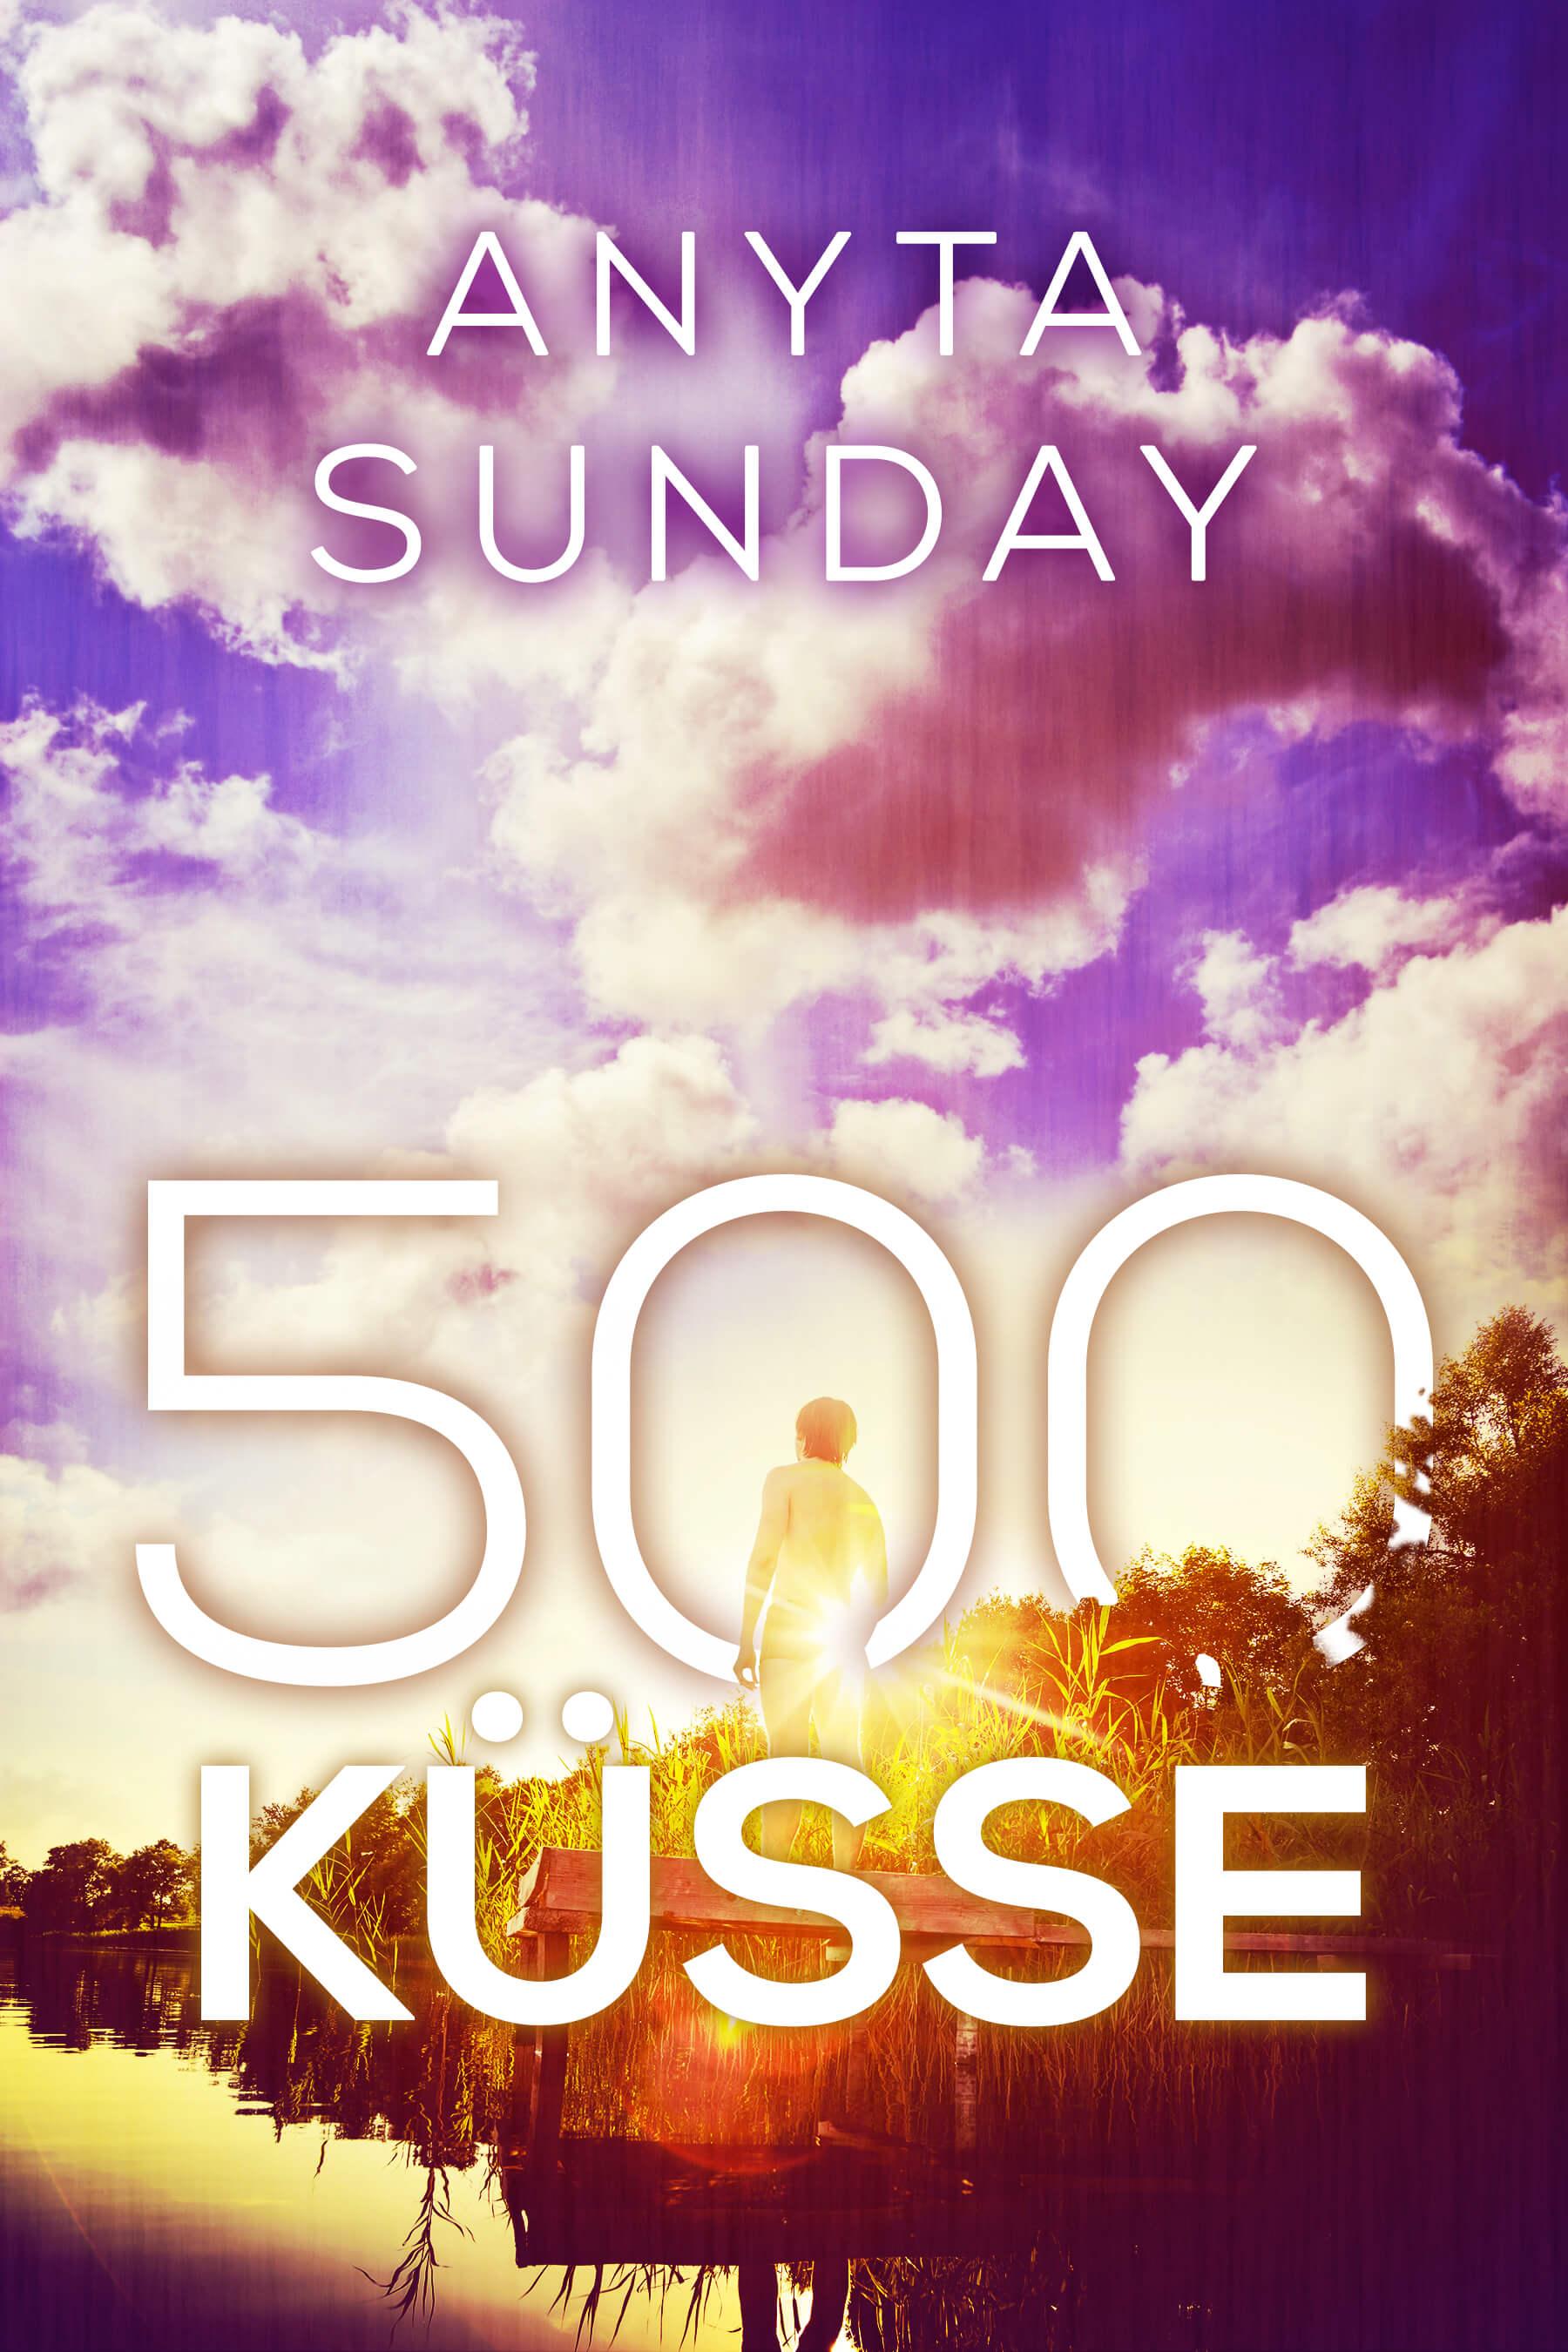 500 kuesse Anyta Sunday Gay Romance